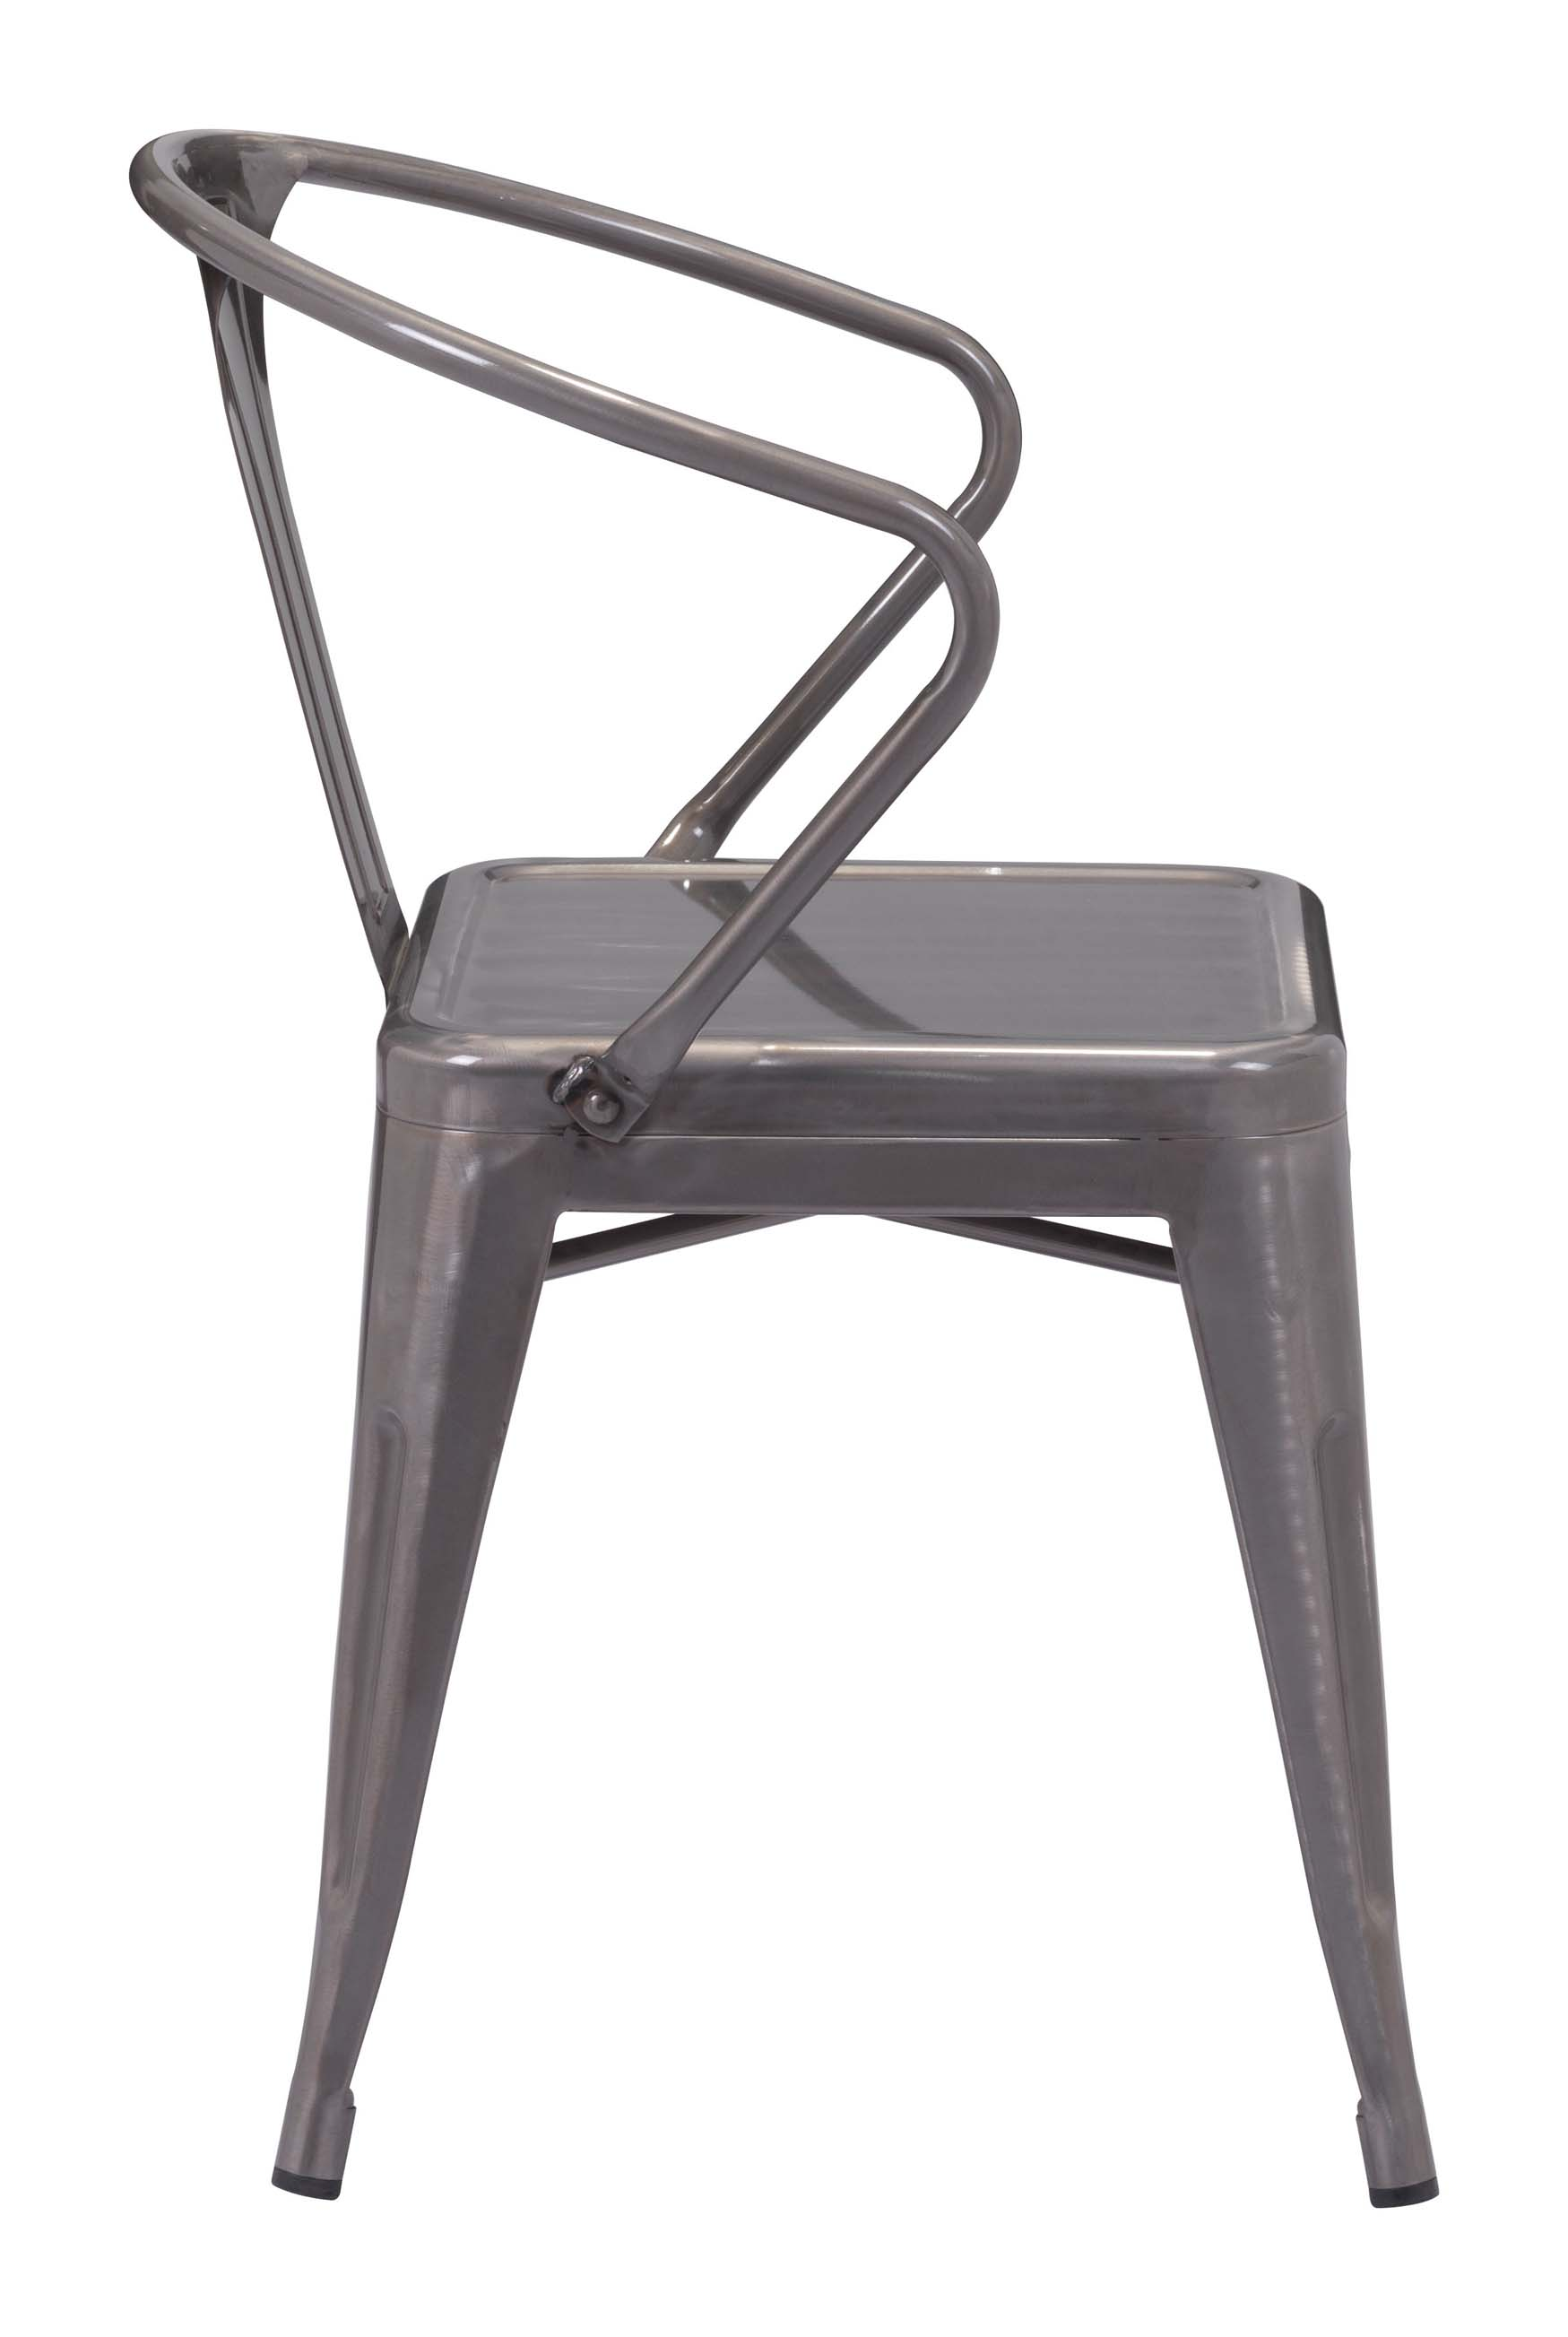 Zuo Modern Helix Dining Chair